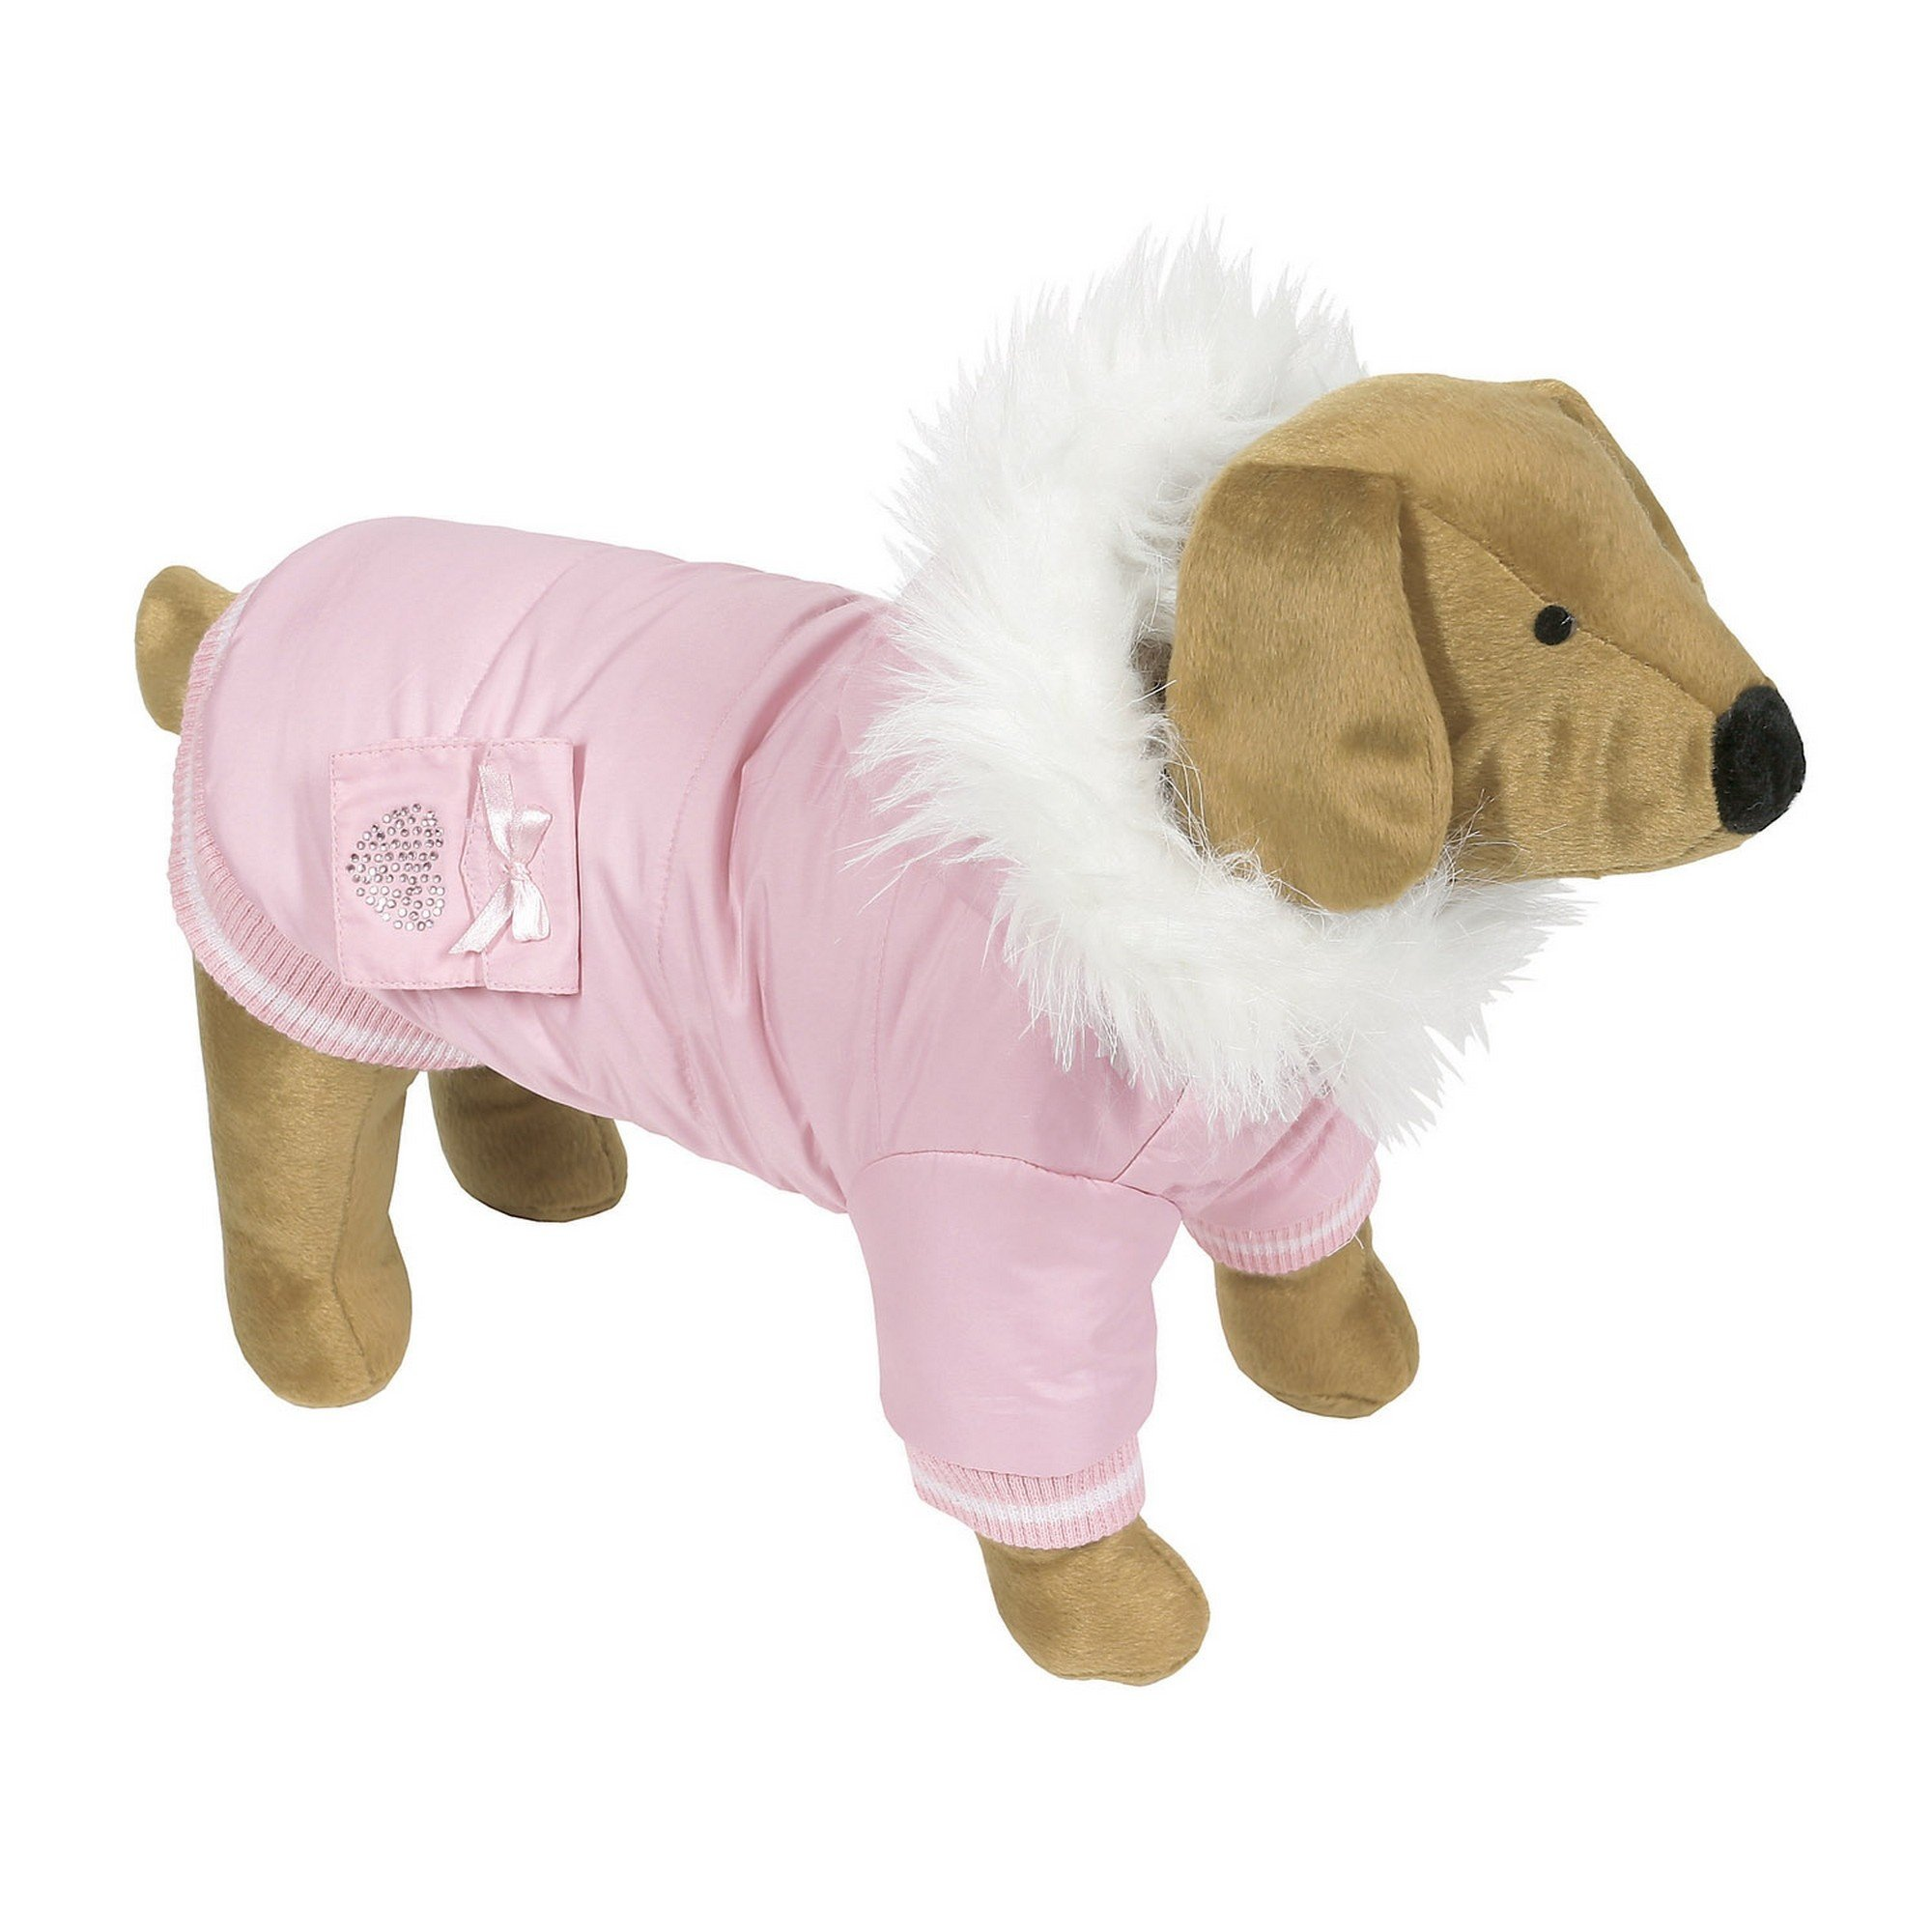 Animal Kingdom Doggy Things Diamante Pocket Parka Waterproof Dog Coat (X Small) (Pink)